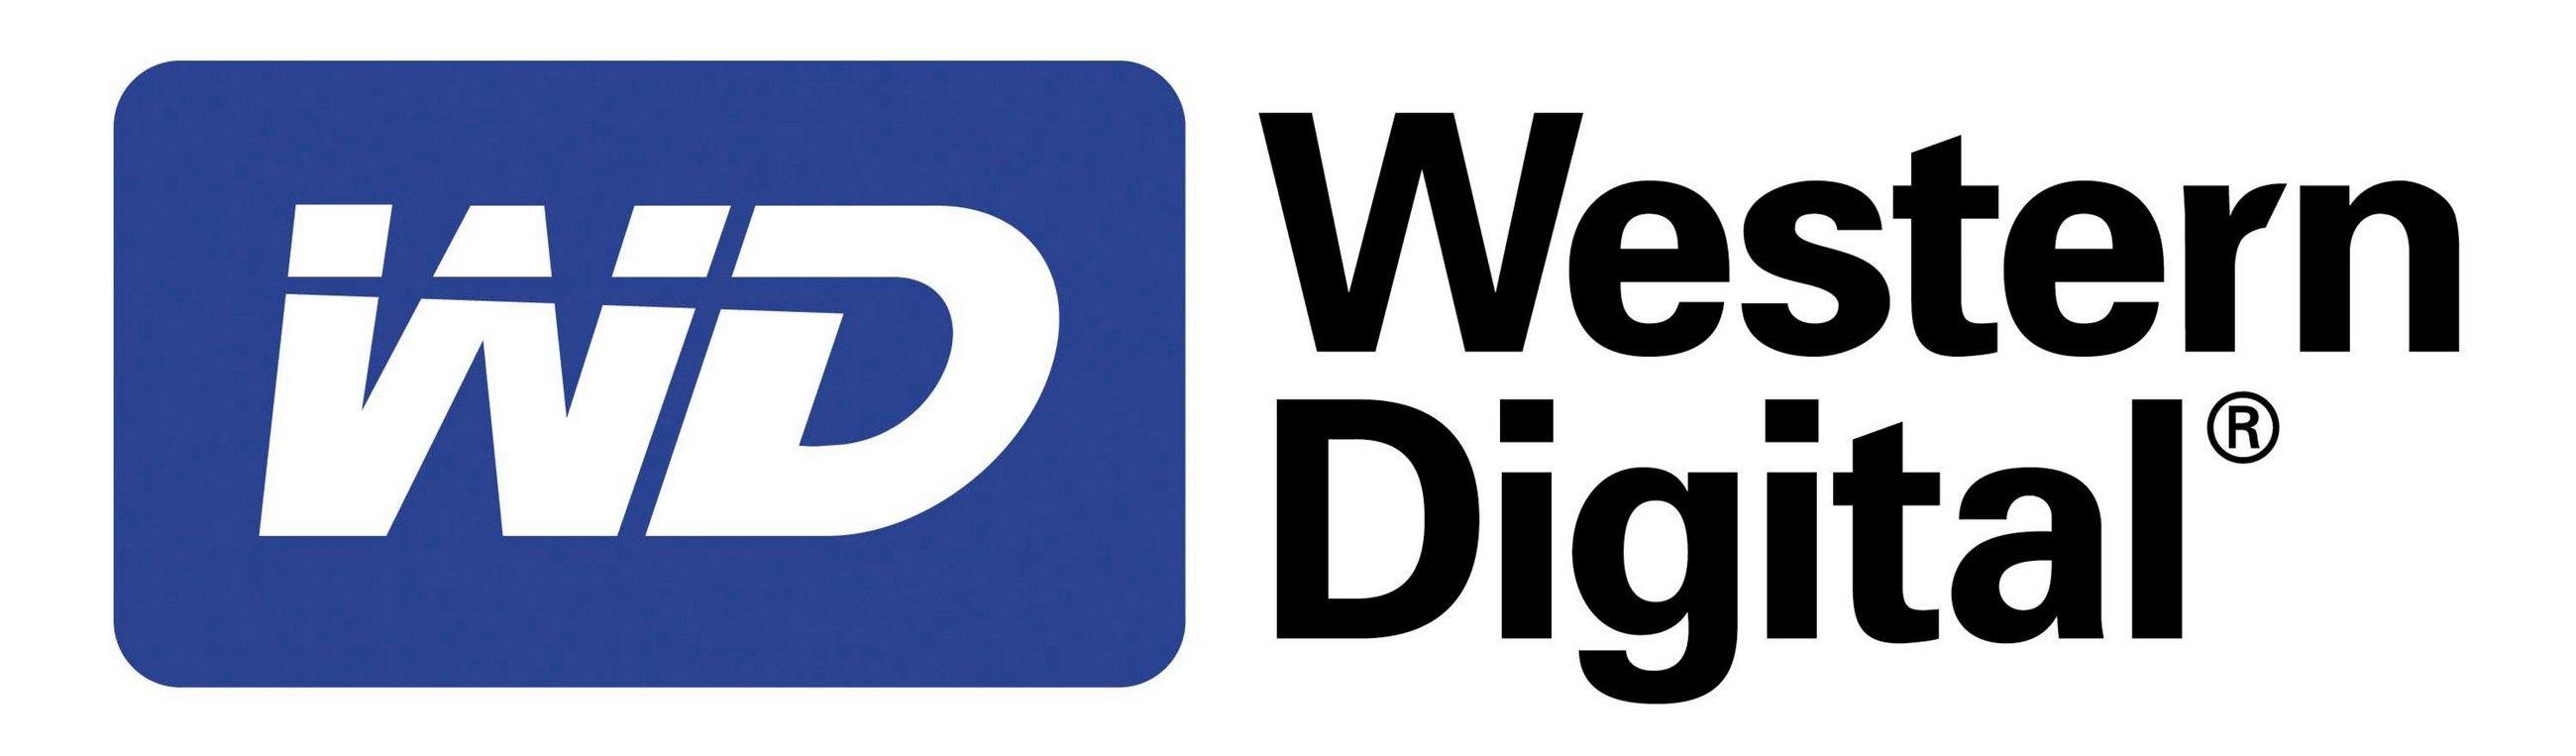 Western Digital Logo [EPS-PDF] Vector EPS Free Download, Logo, Icons, Brand  Emblems | Digital, External hard drive, Black friday computer